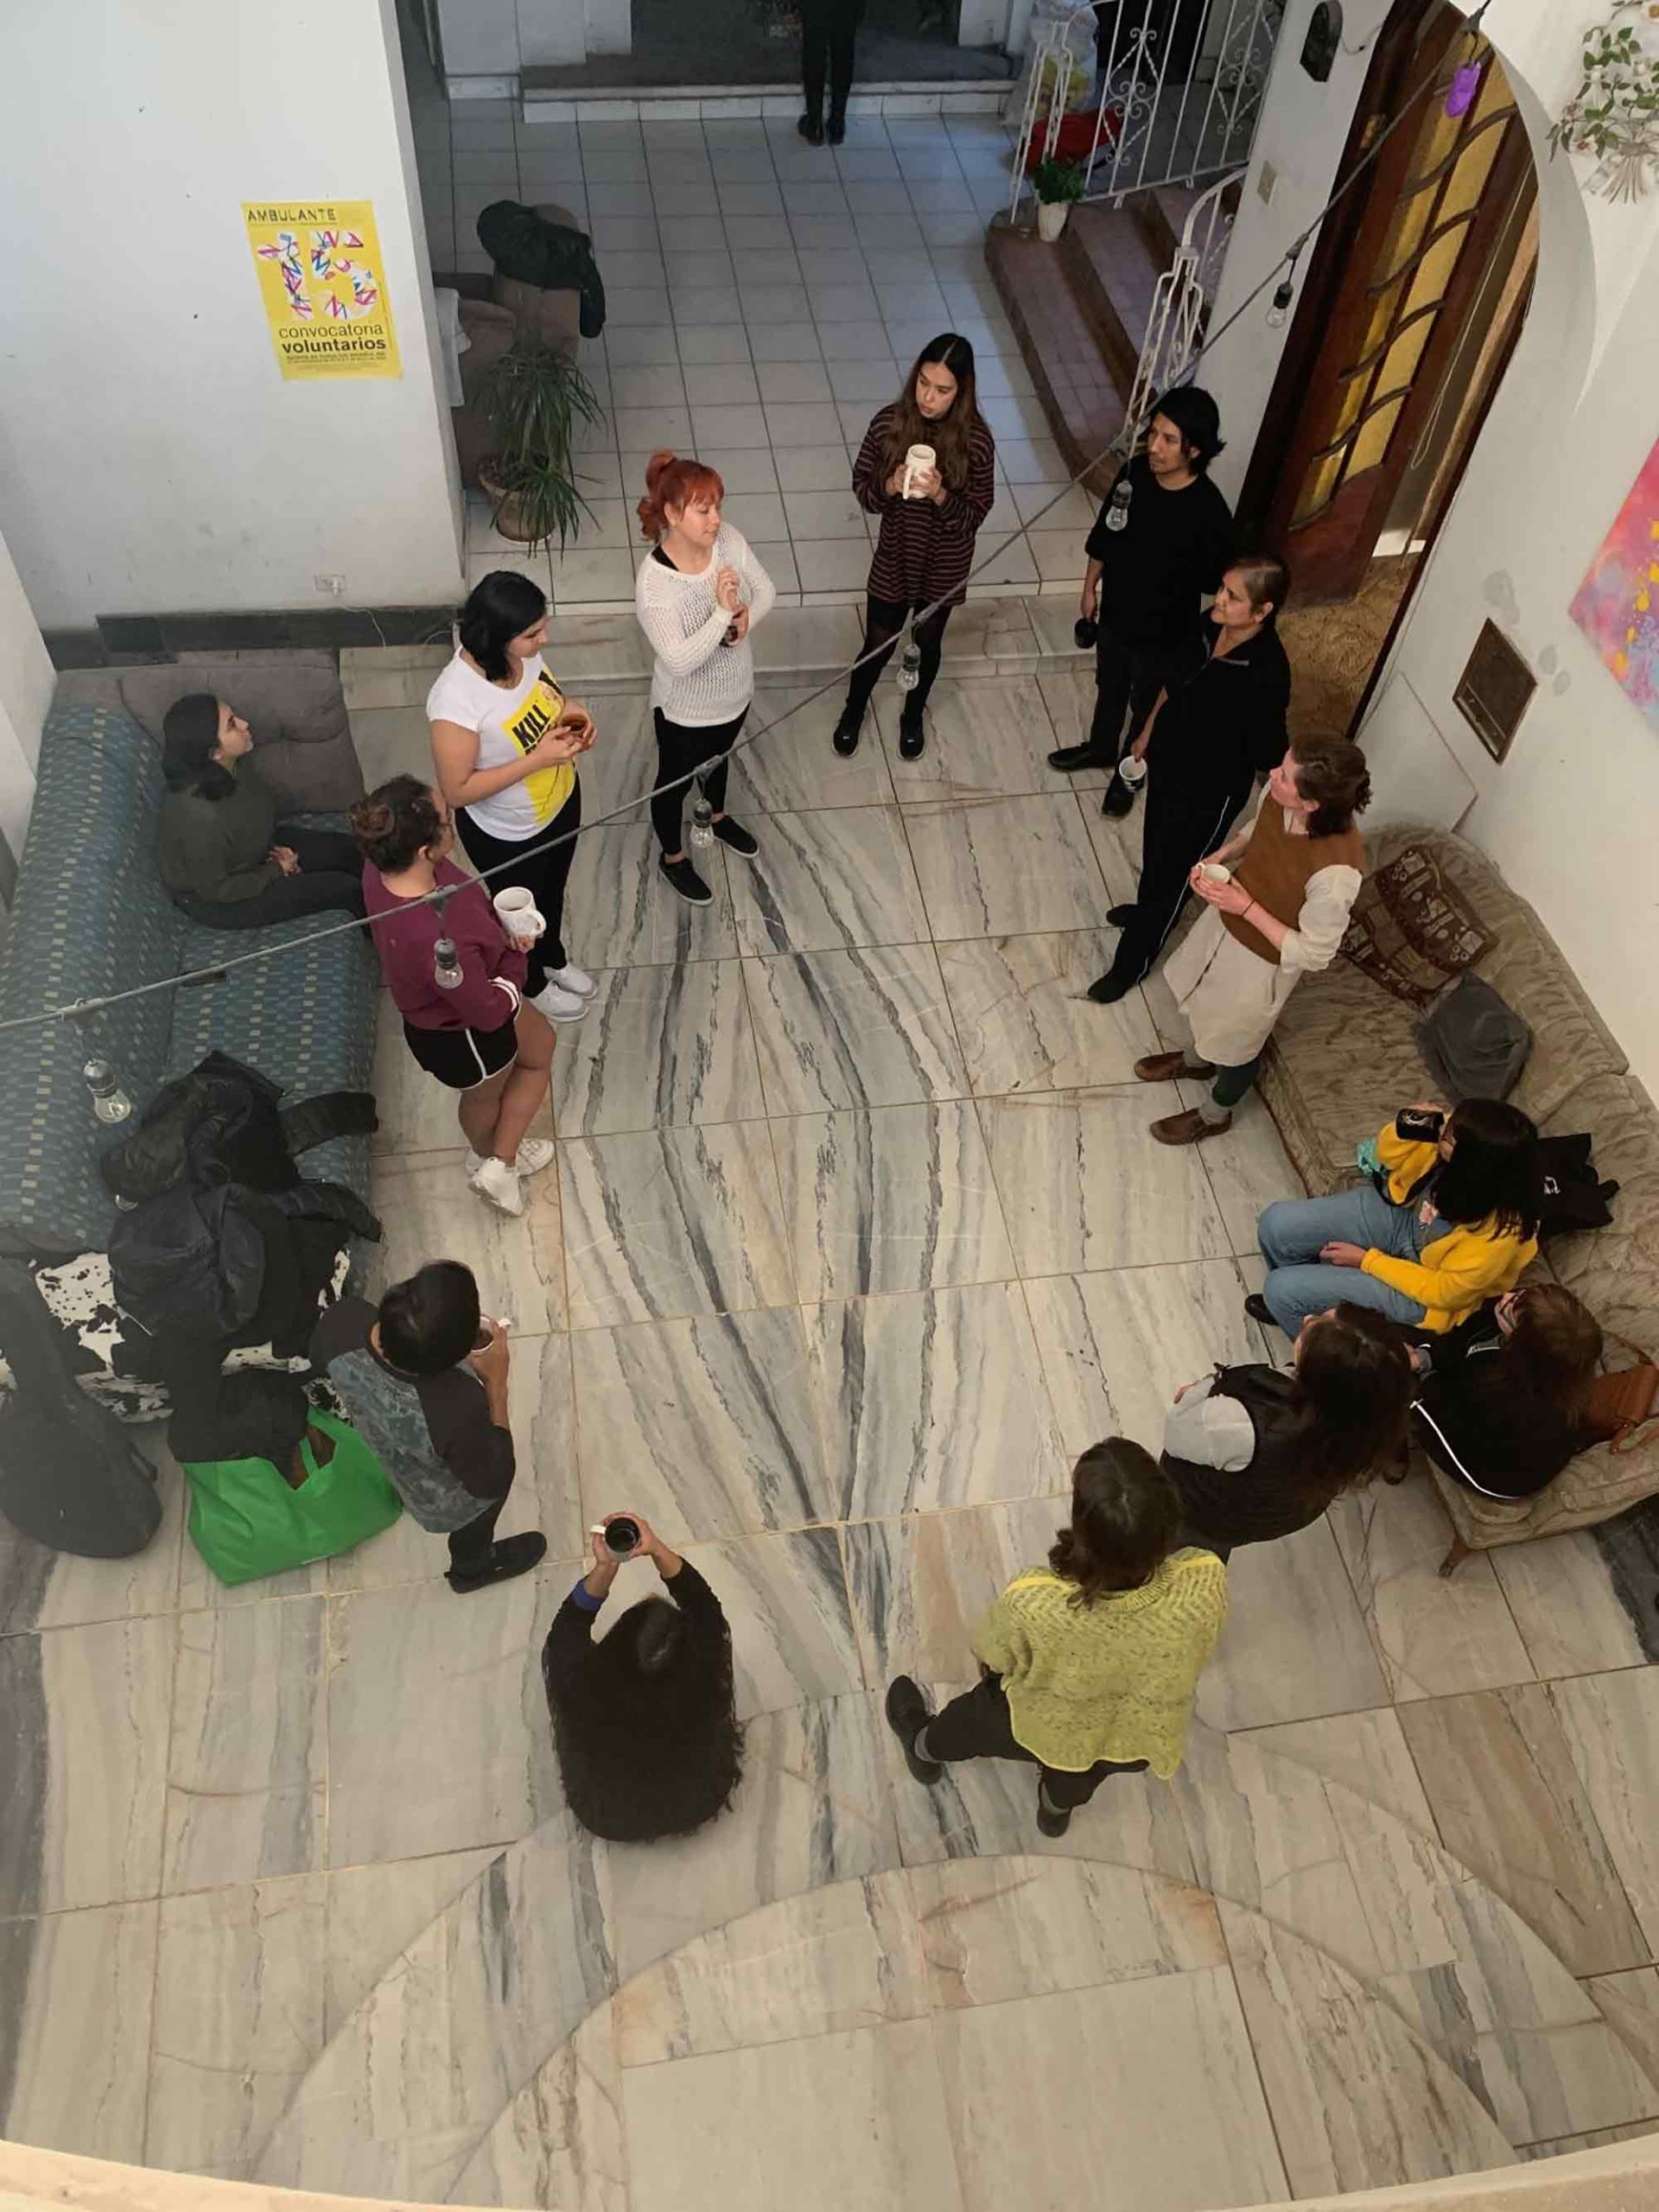 Hungry Mothers workshop at casa centro 16 (CX16) in Ciudad Juárez, Mexico. Photograph: Hannah Ennis